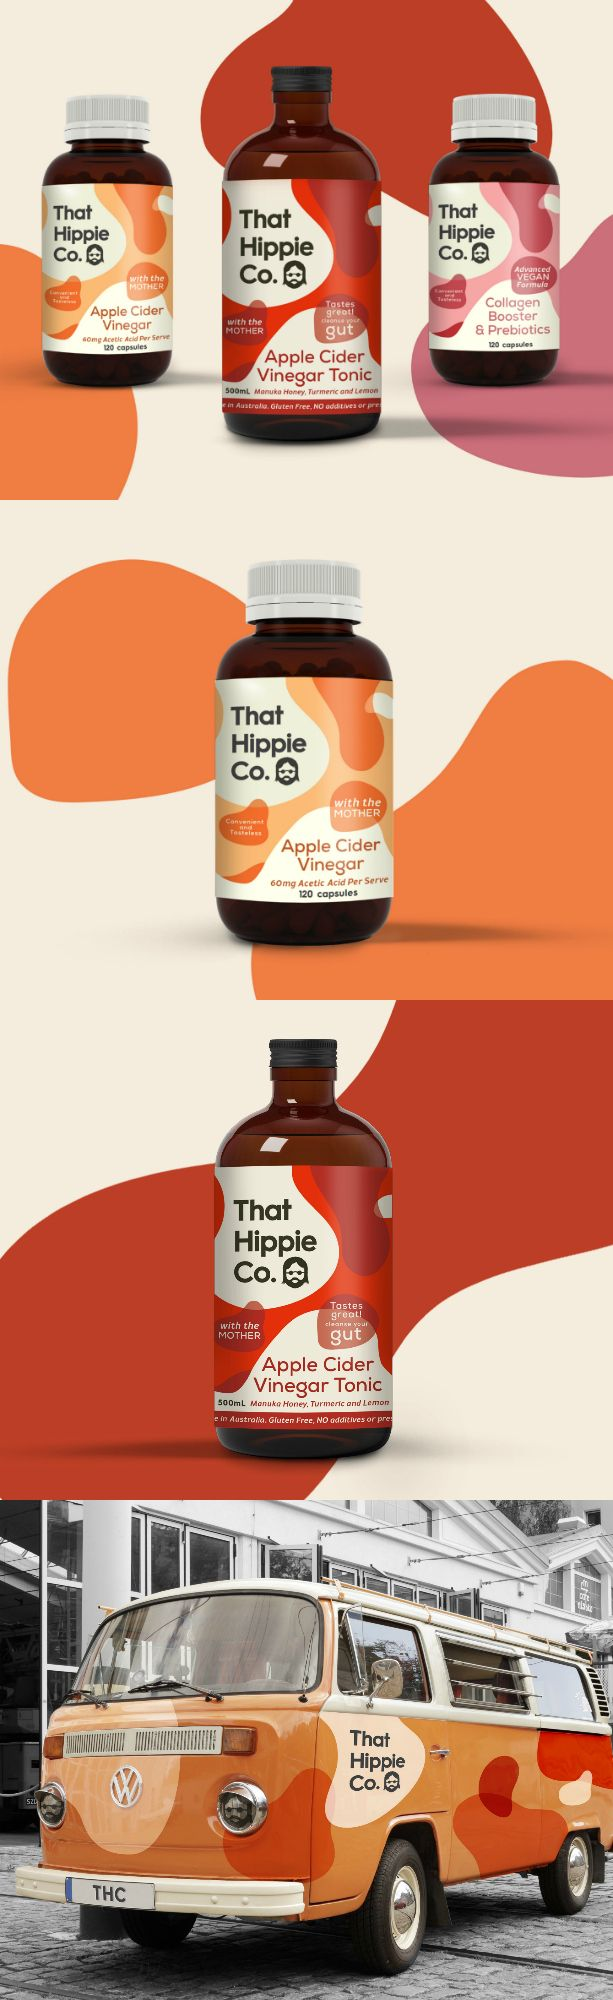 Australian Health Company Hippie Co Packaging Design World Brand Design Food Packaging Design Logo Packaging Design Healthy Food Branding